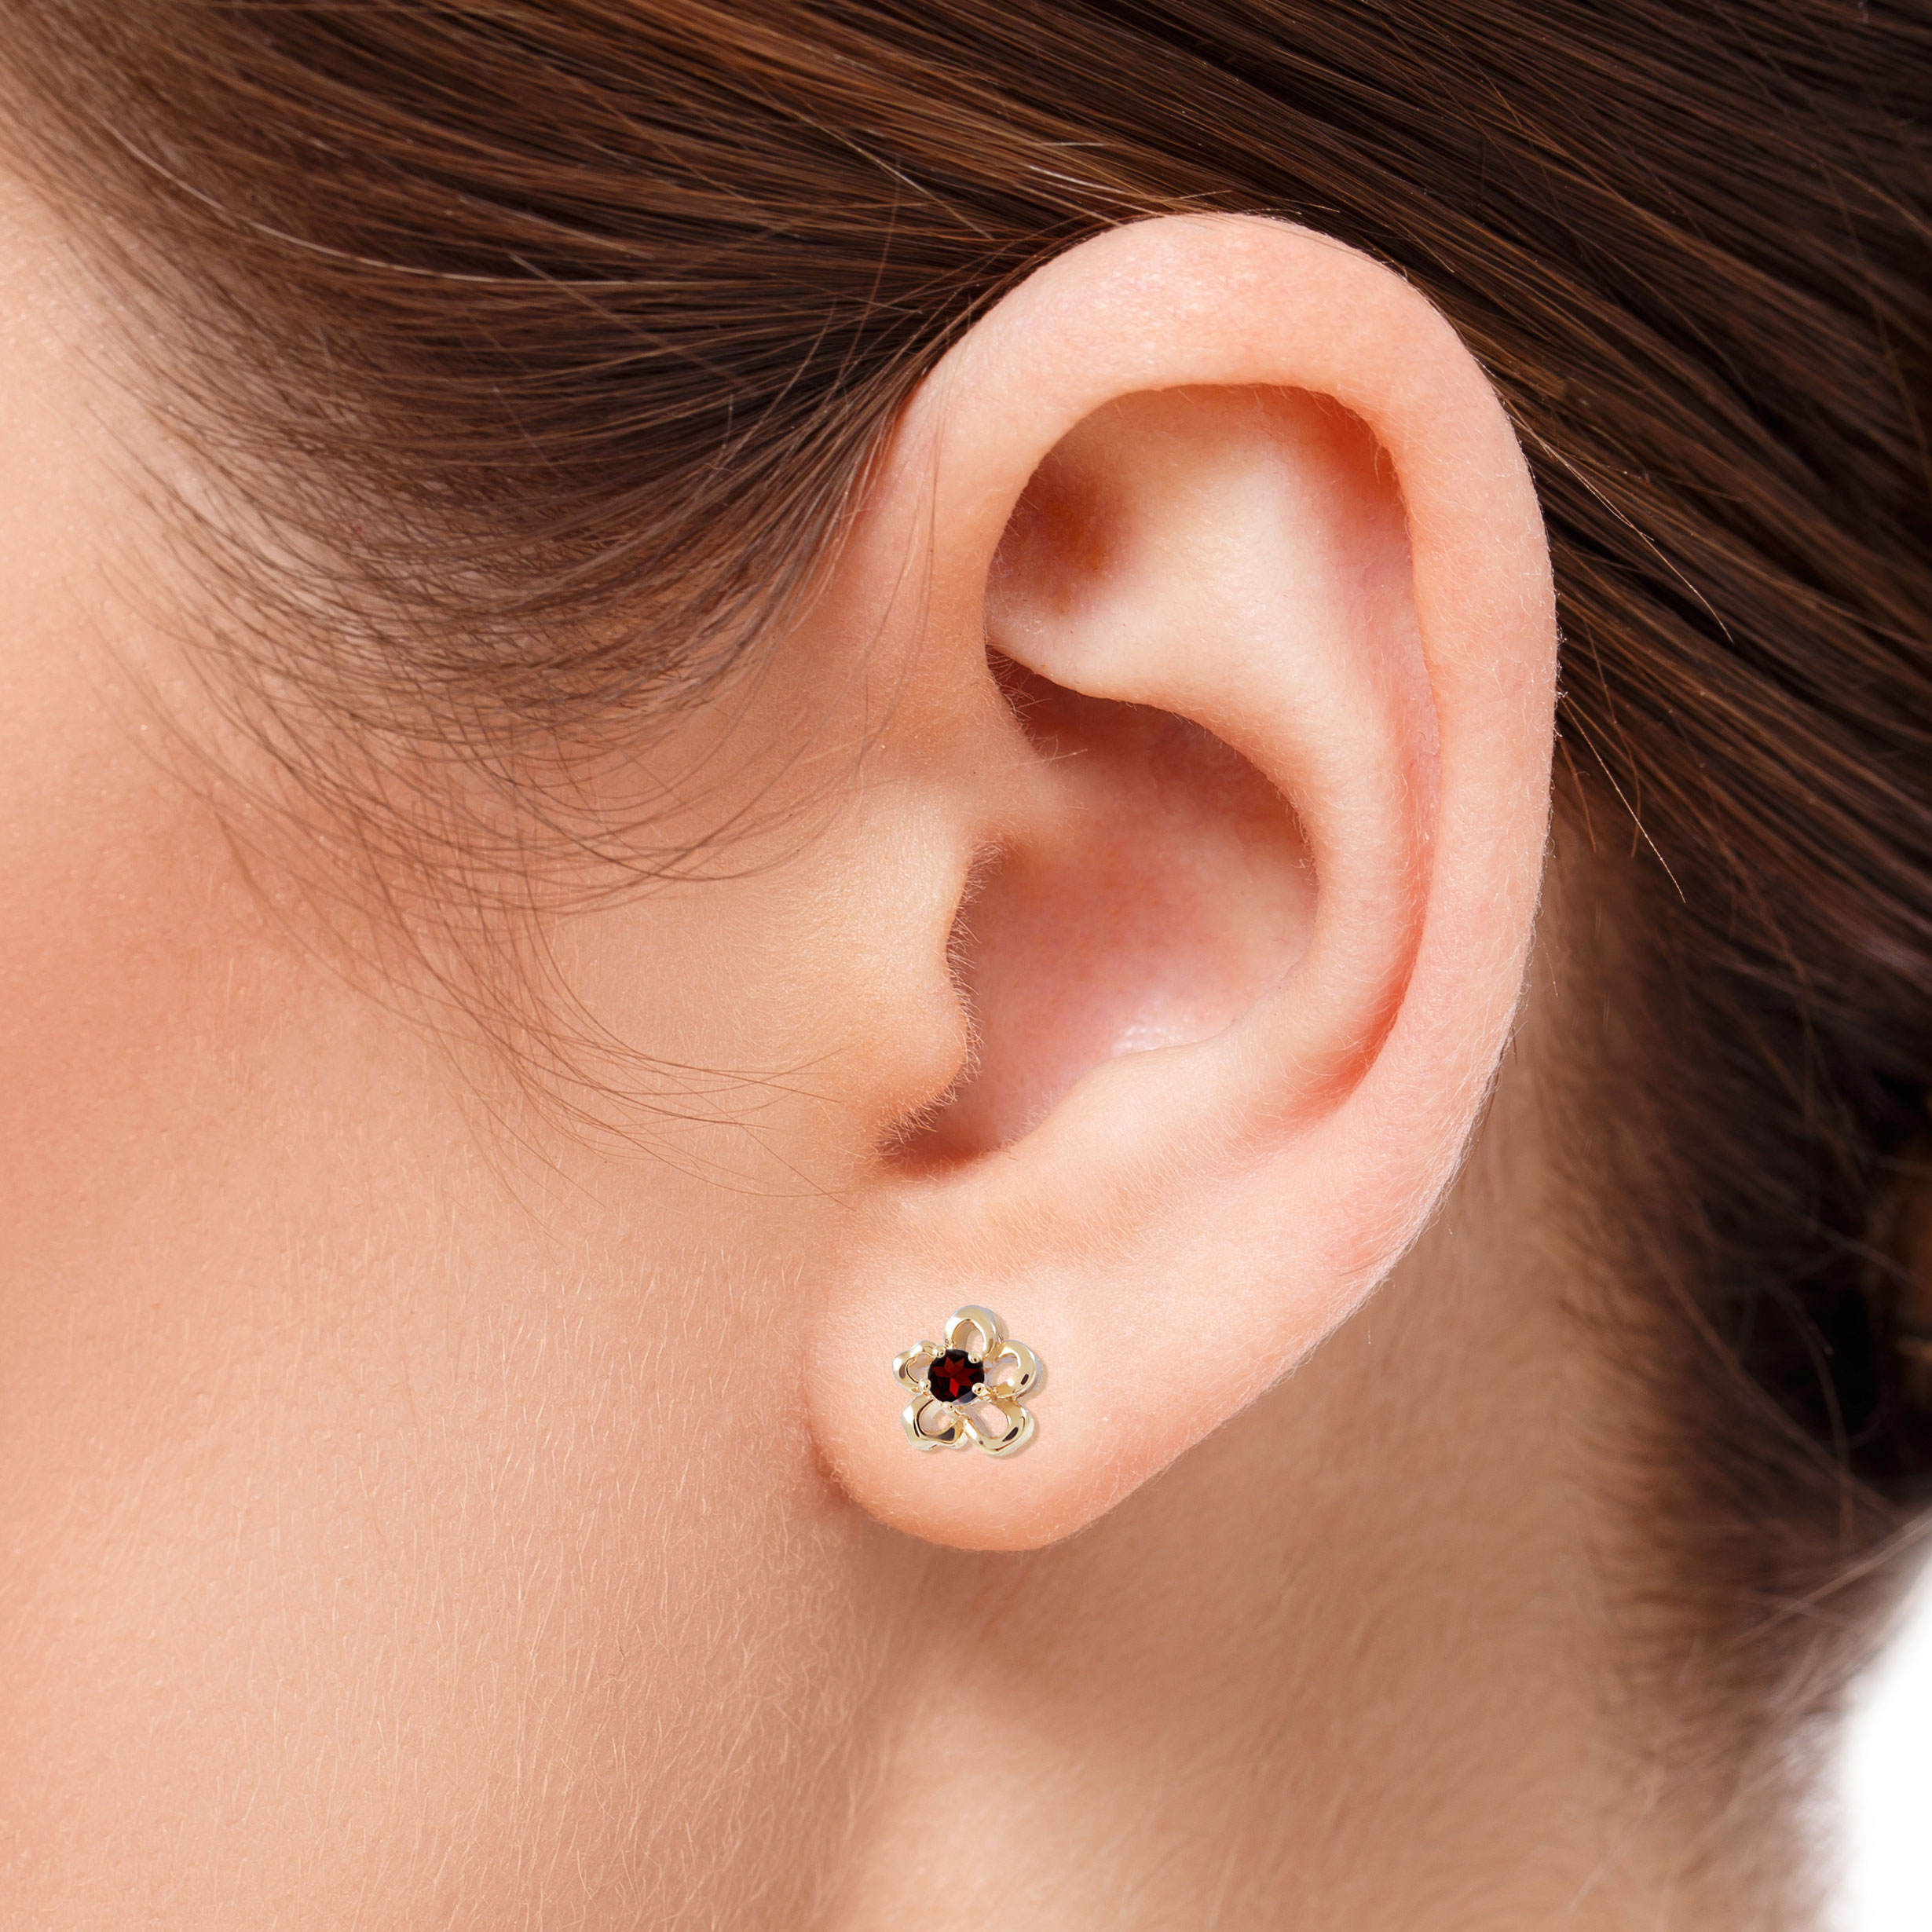 Гвоздики в уши фото